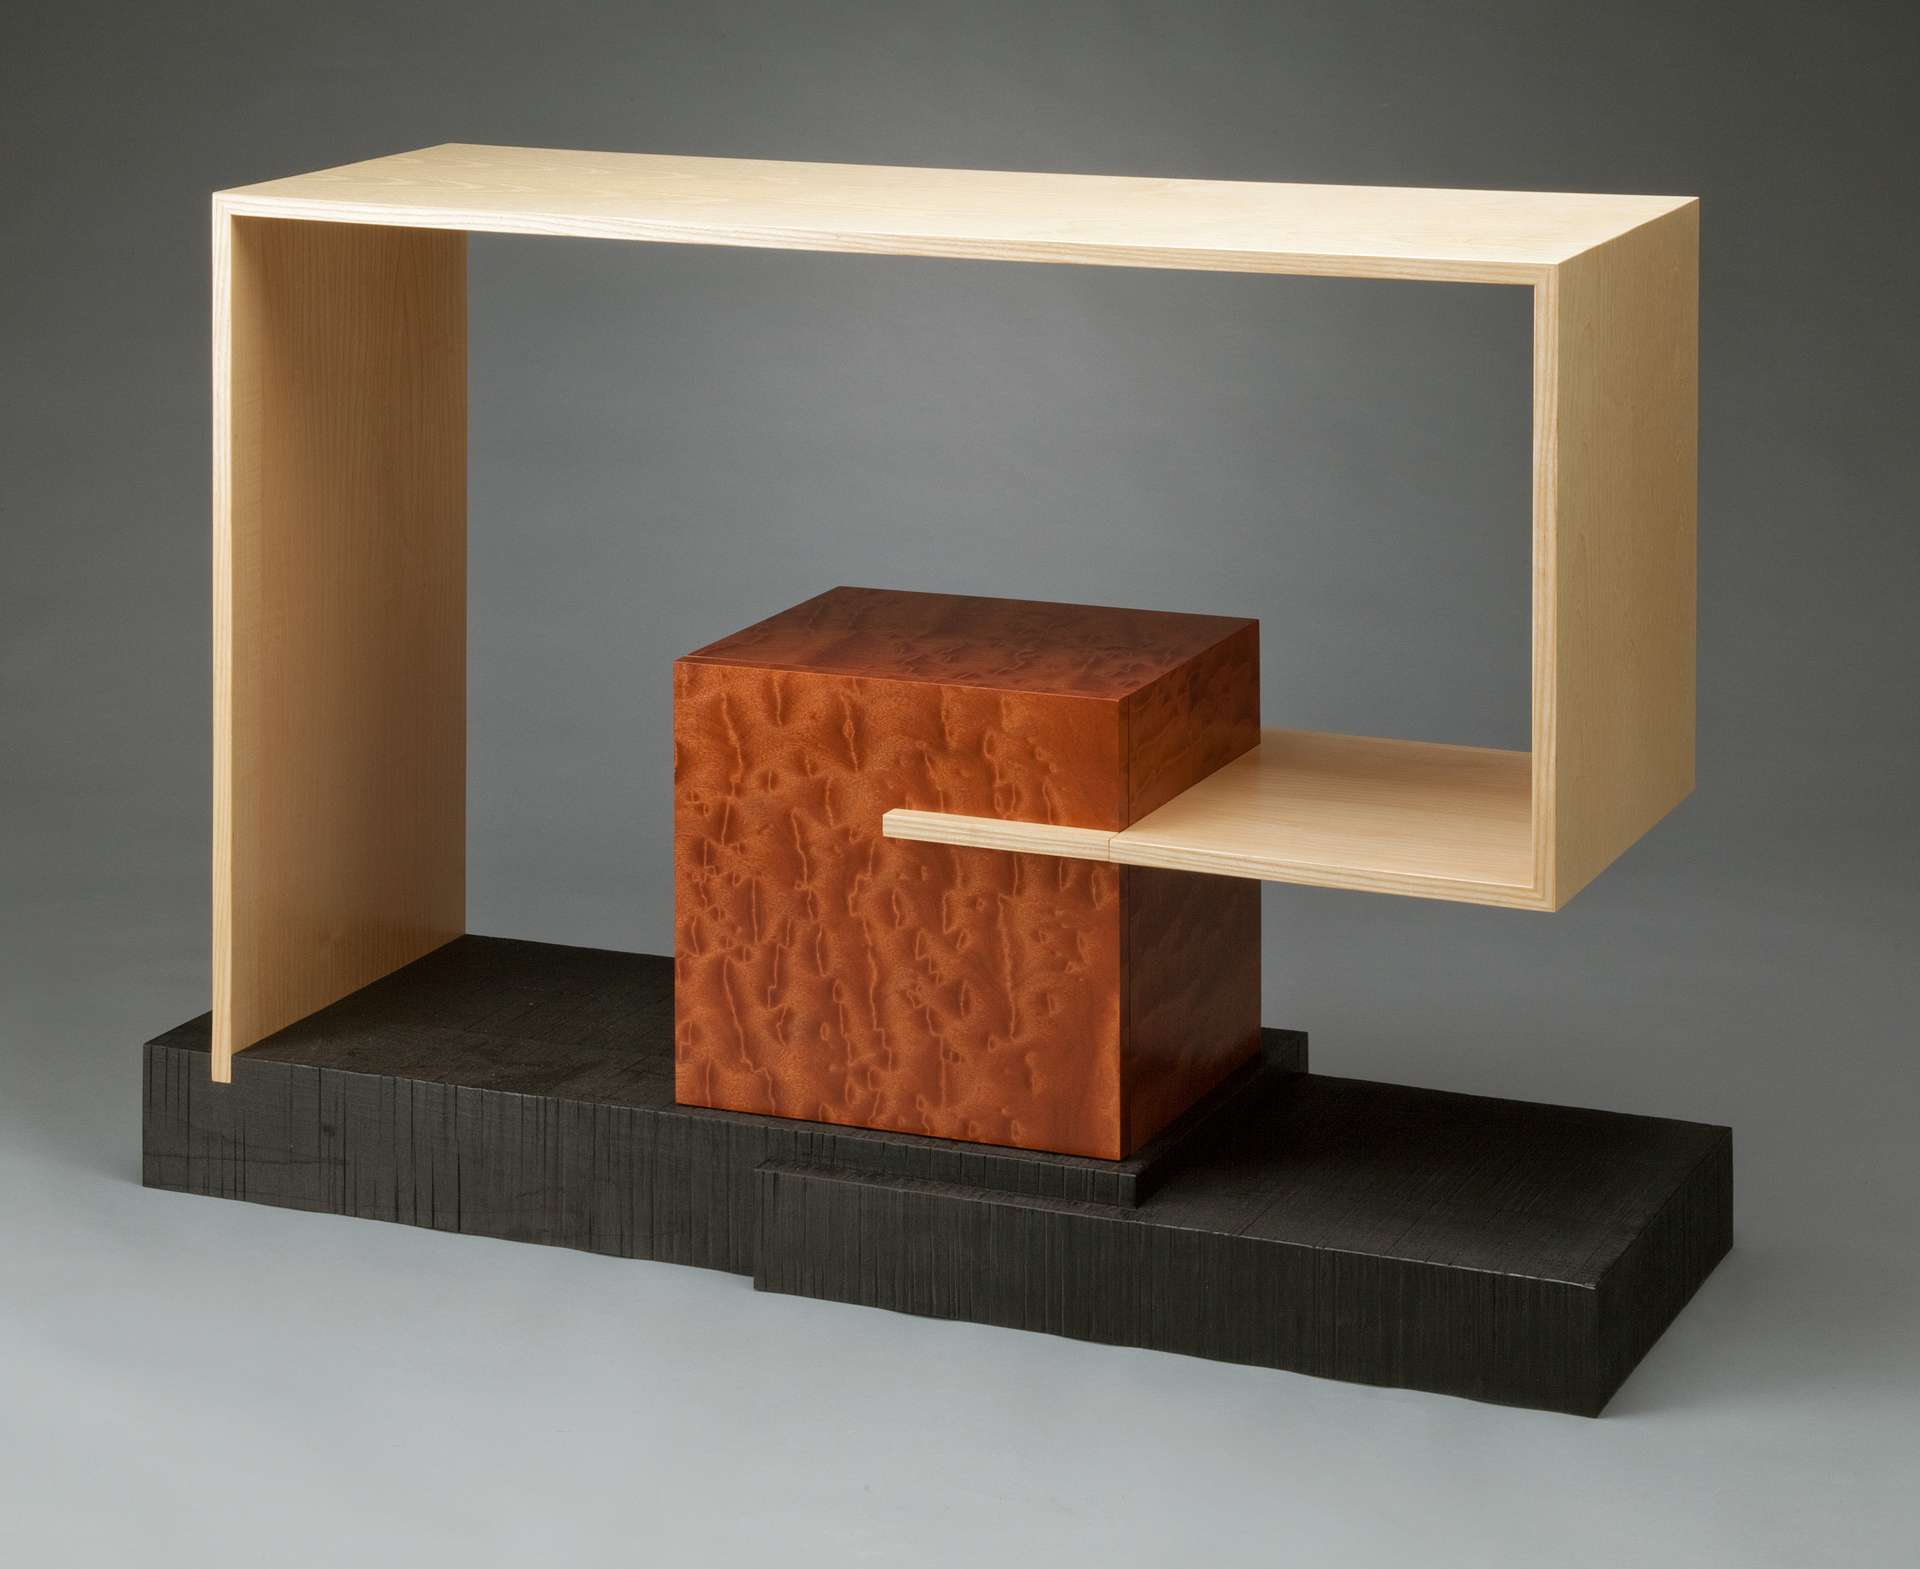 Holl Table $2700  white ash, pommele sapele, burnt rough sewn poplar 35 x 47 x 15